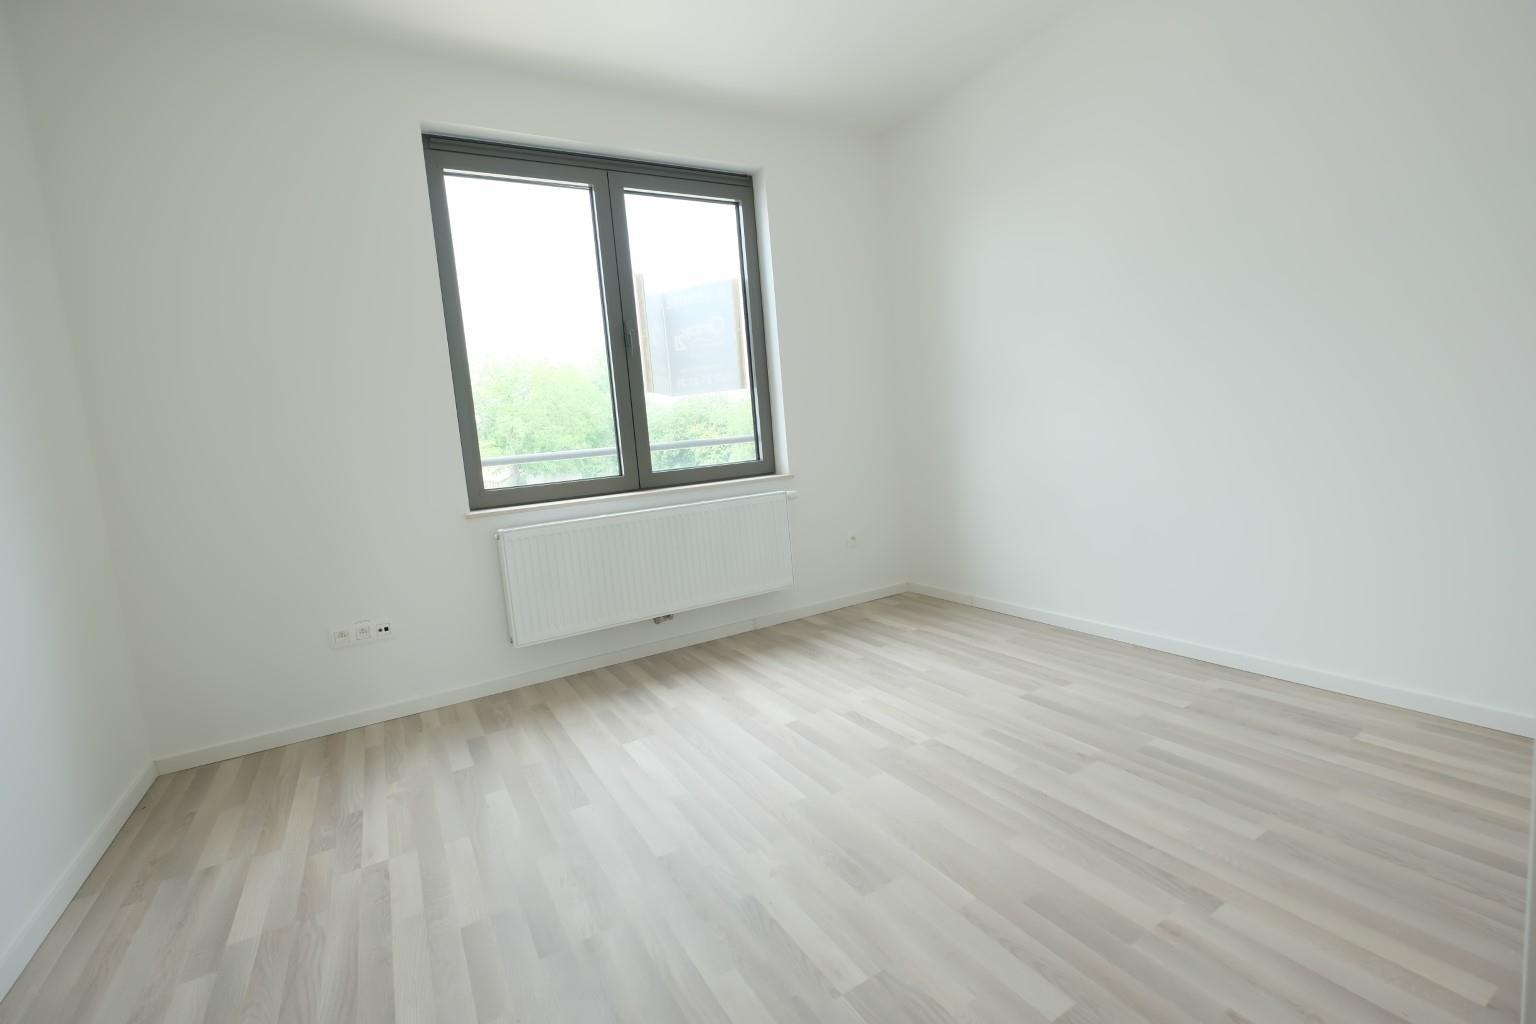 Appartement - Soignies - #3015984-14